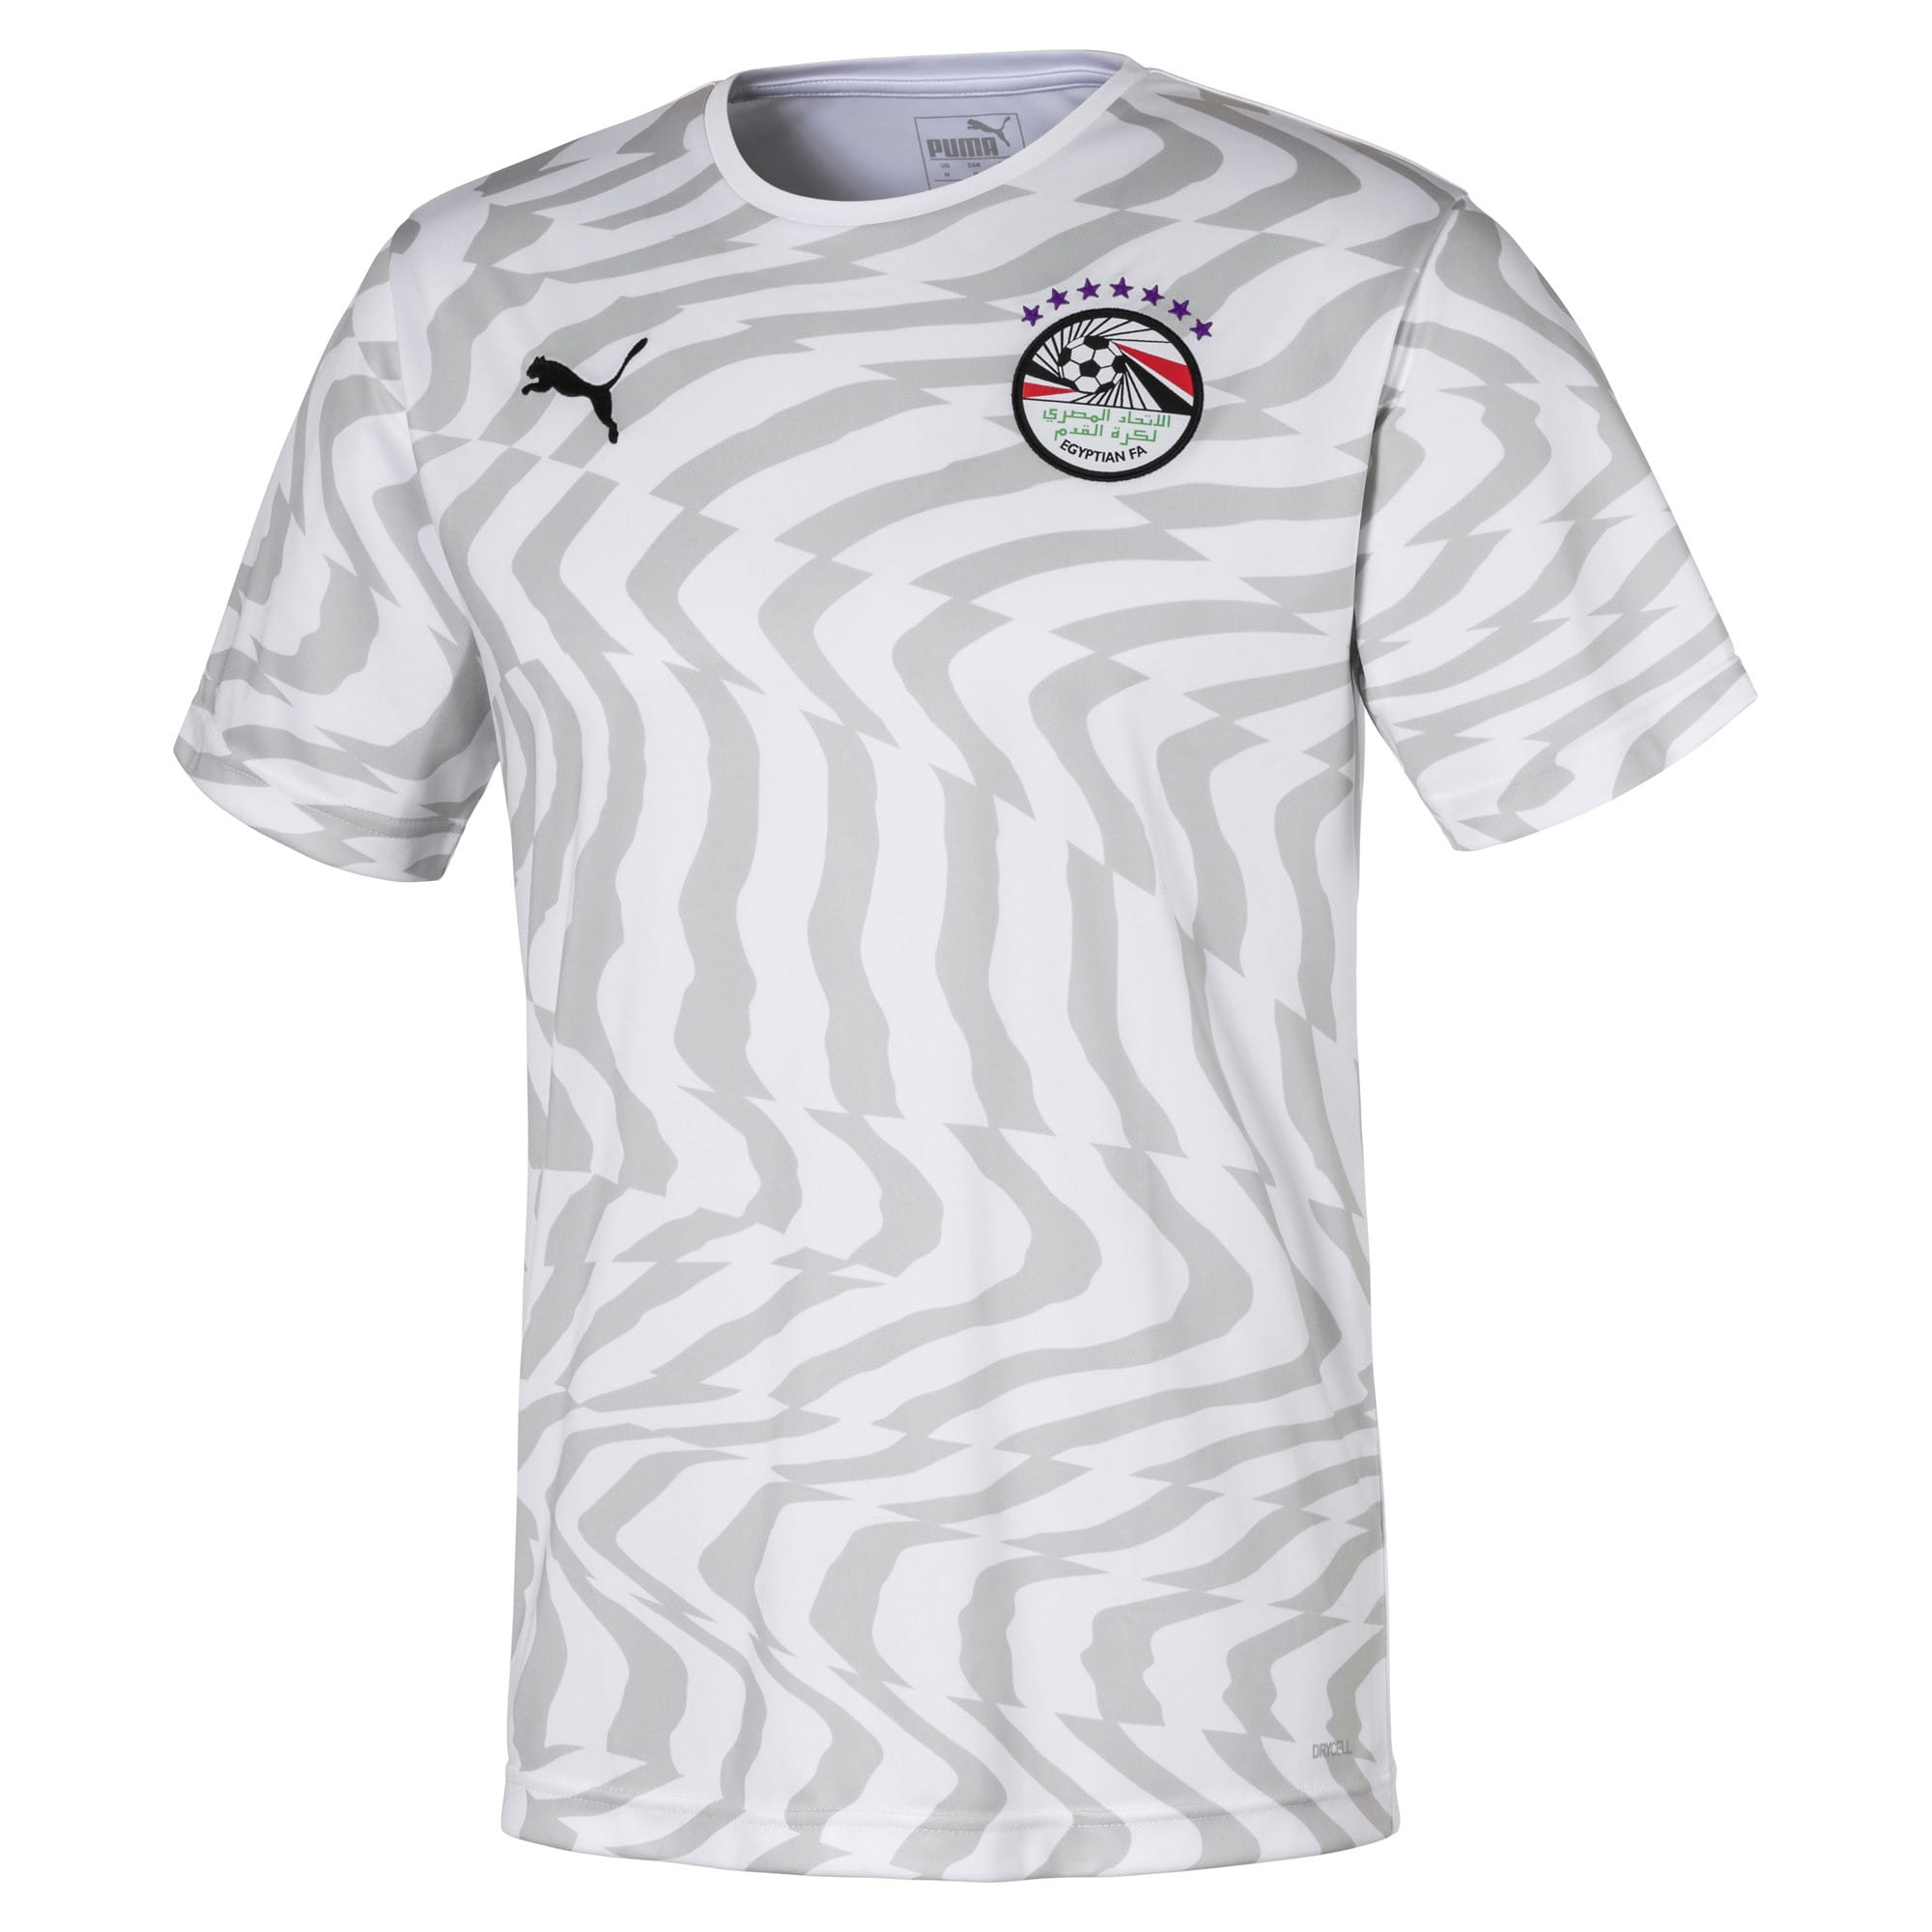 Thumbnail 1 of Egypt Men's Away Replica Jersey, Puma White-Puma Black, medium